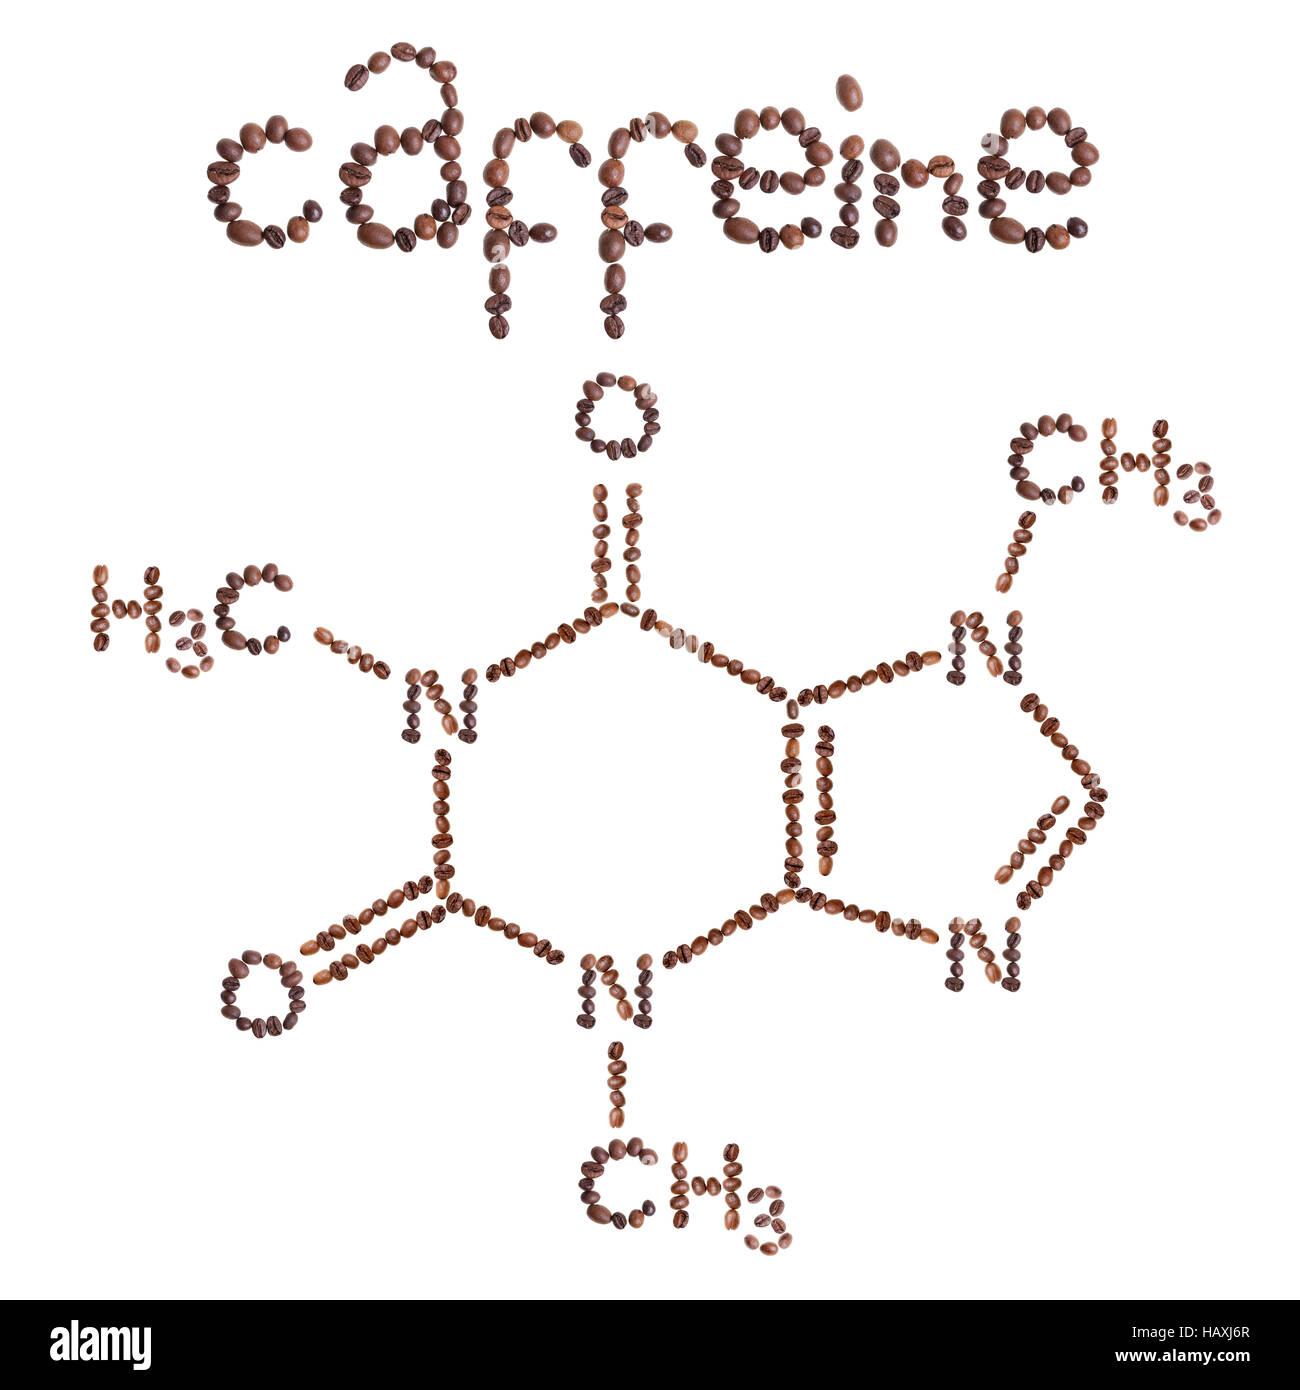 Caffeine Chemical Formula Science Symbol Imgenes De Stock